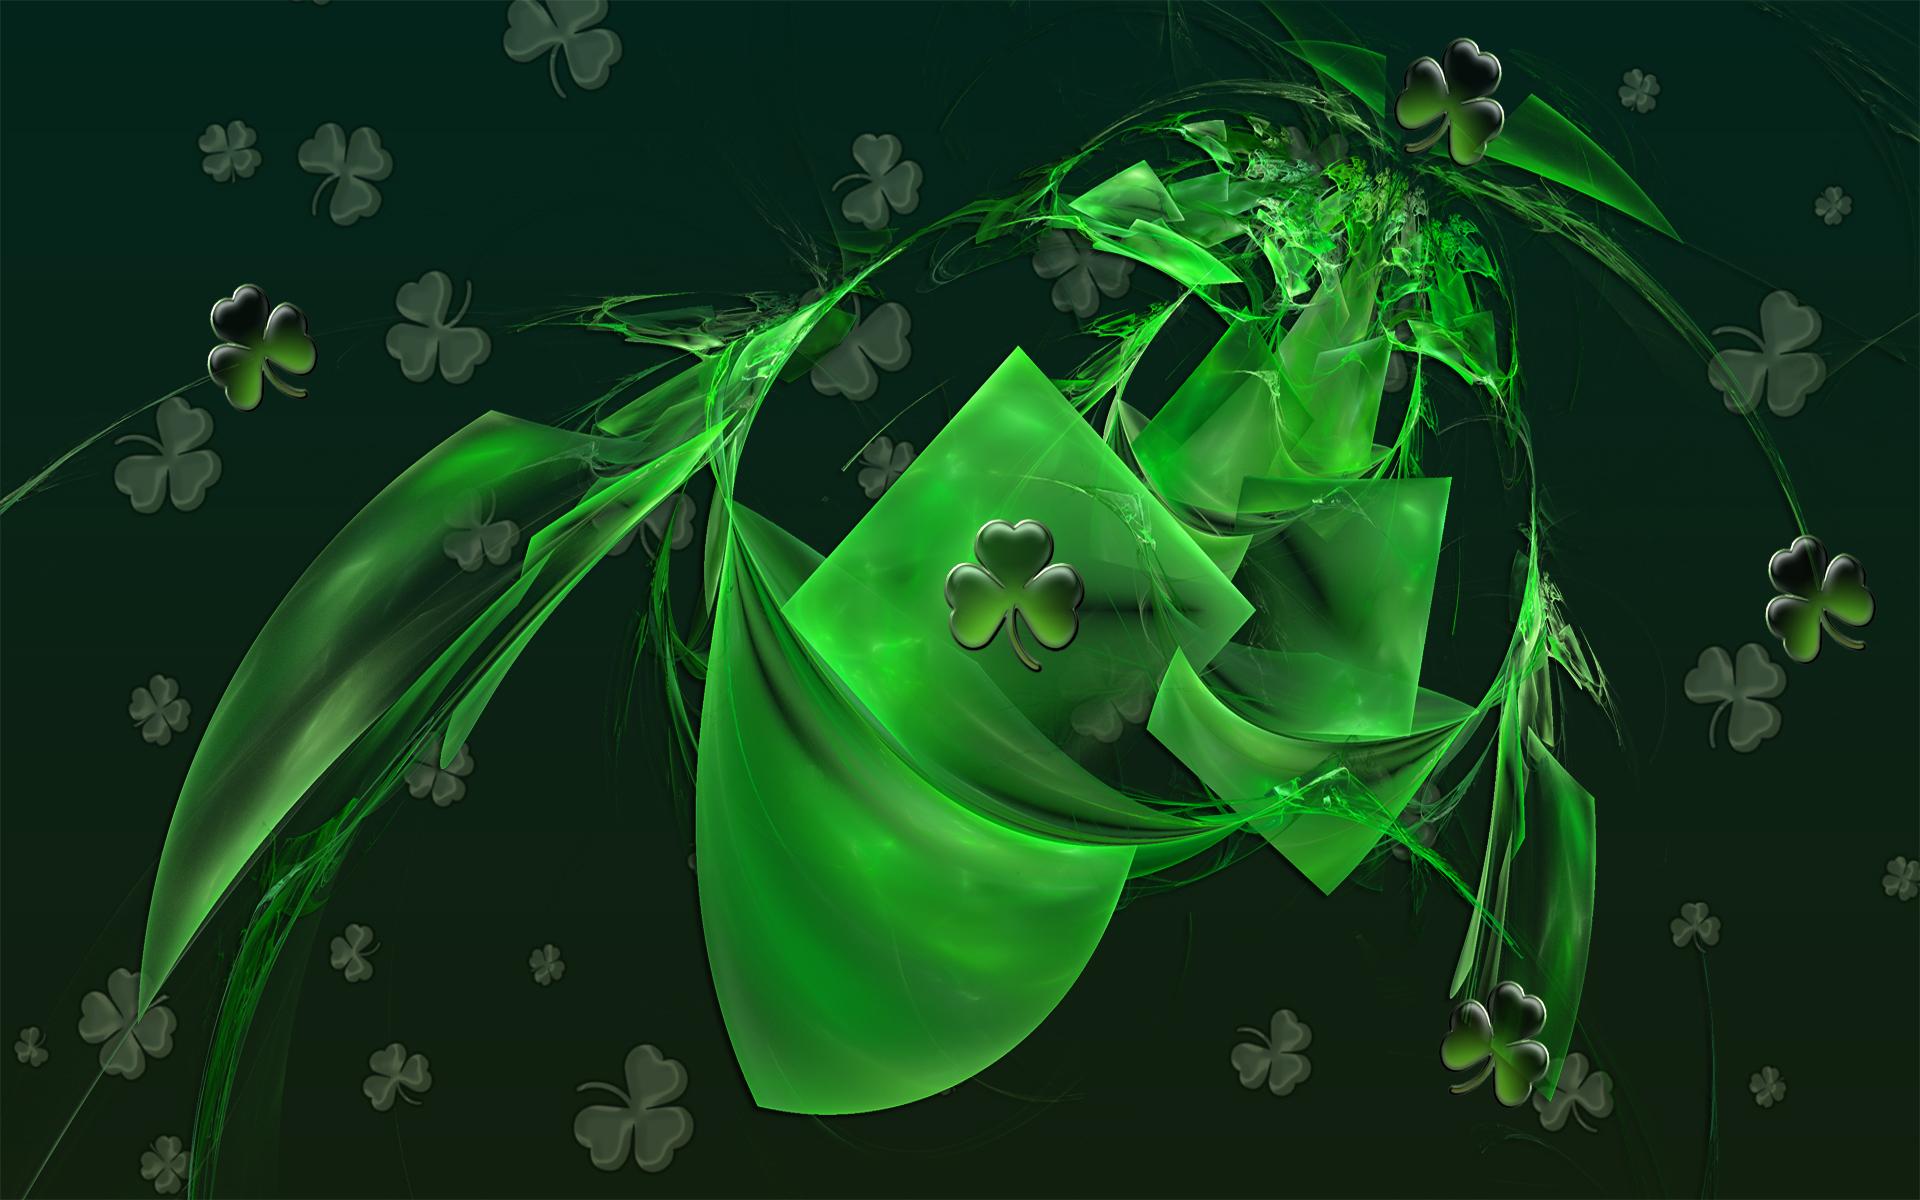 St Patricks Day wallpaper - 367950